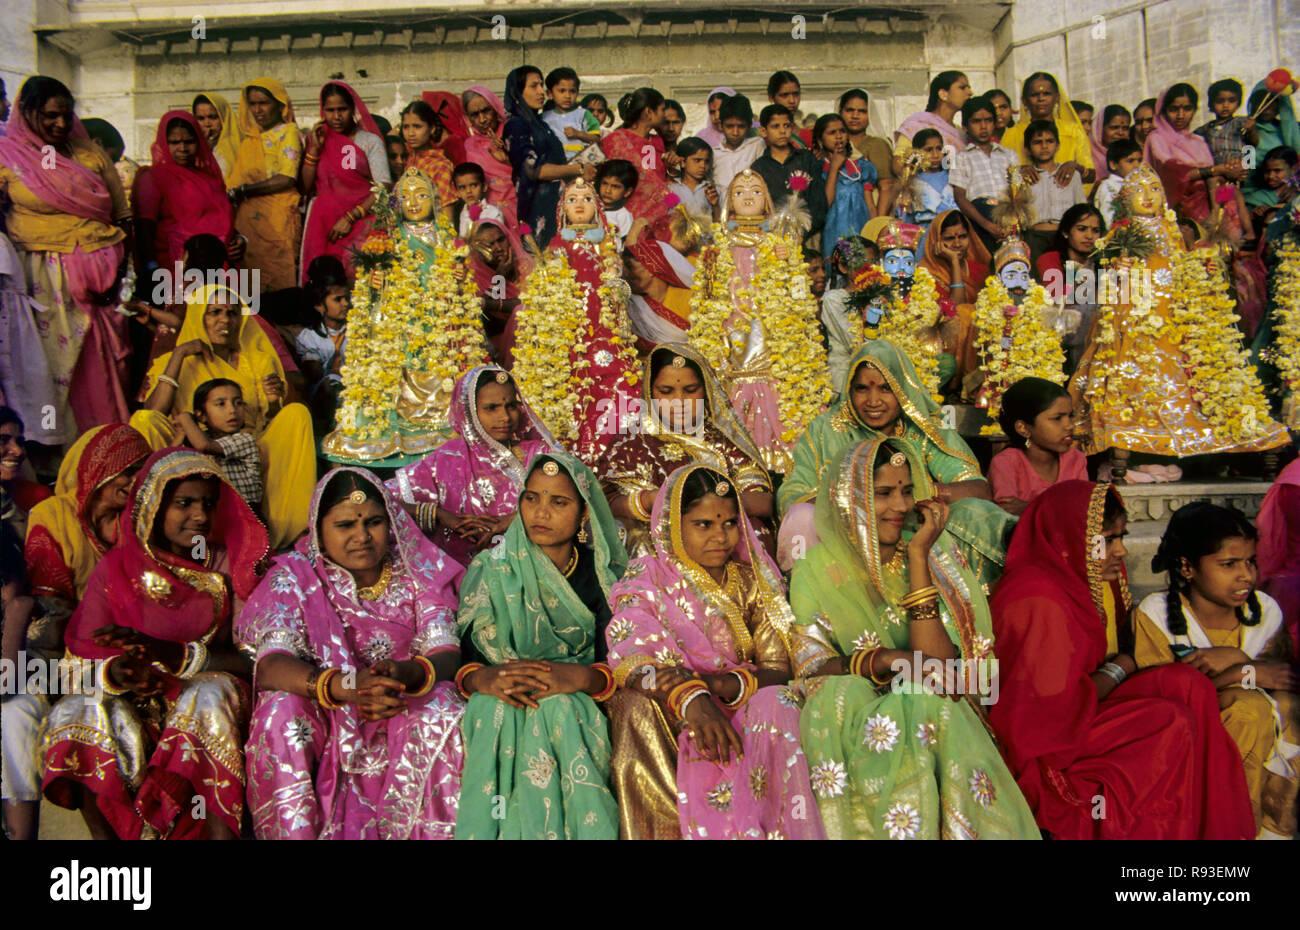 Gangaur Festival, Udaipur, Rajasthan, India Stock Photo - Alamy